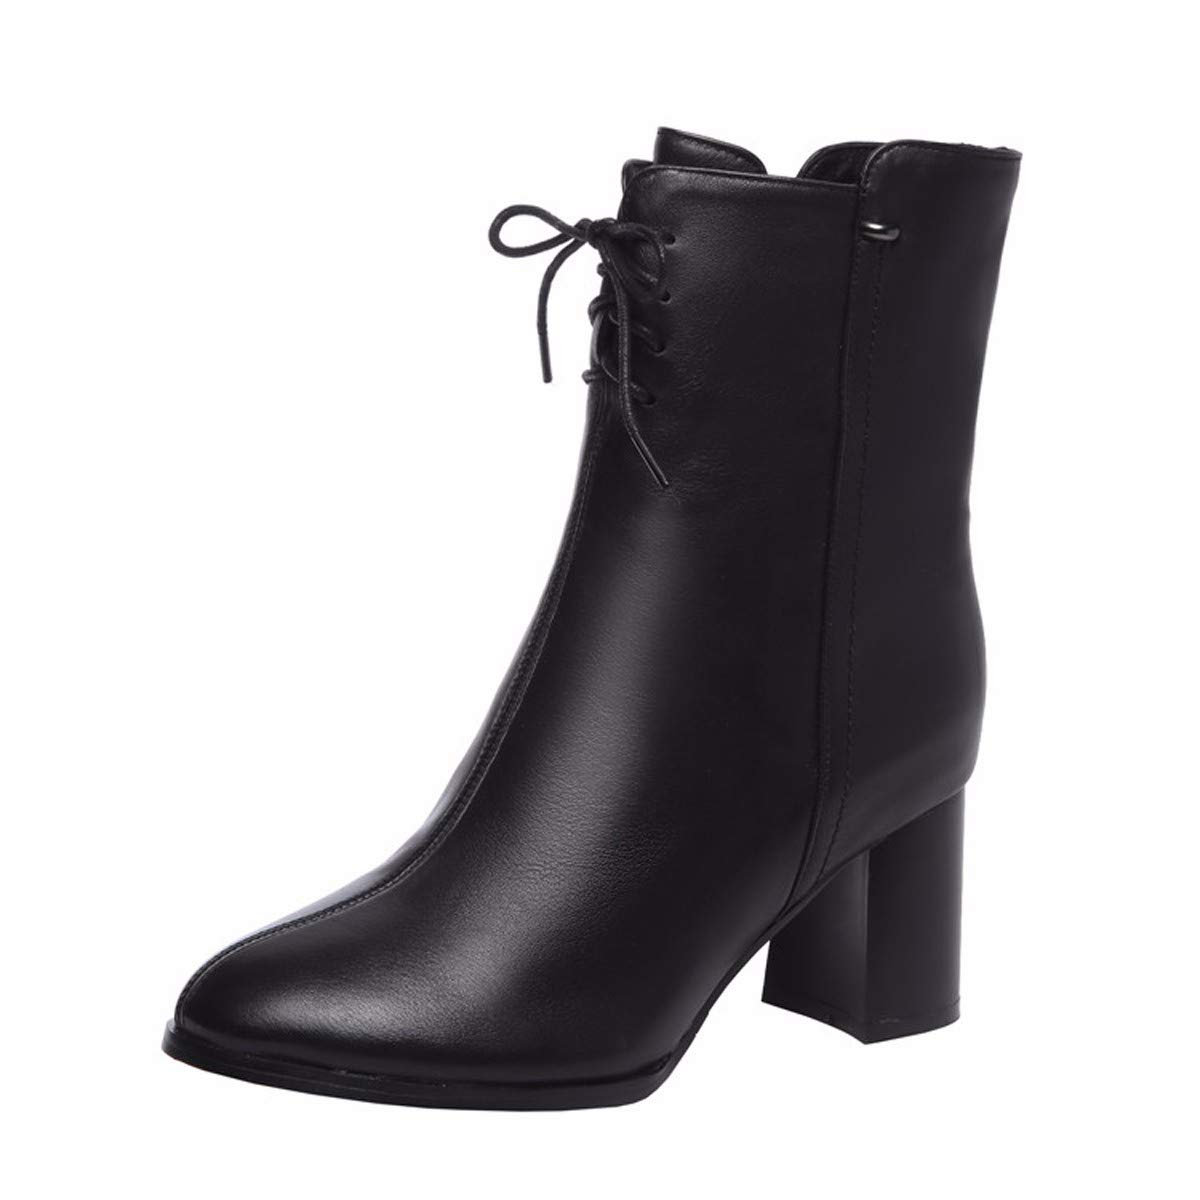 KOKQSX-Damen - Stiefel Mode Leder runden Kopf Kurze Stiefel Stiefel Stiefel hochhackige Stiefel. d3cb18